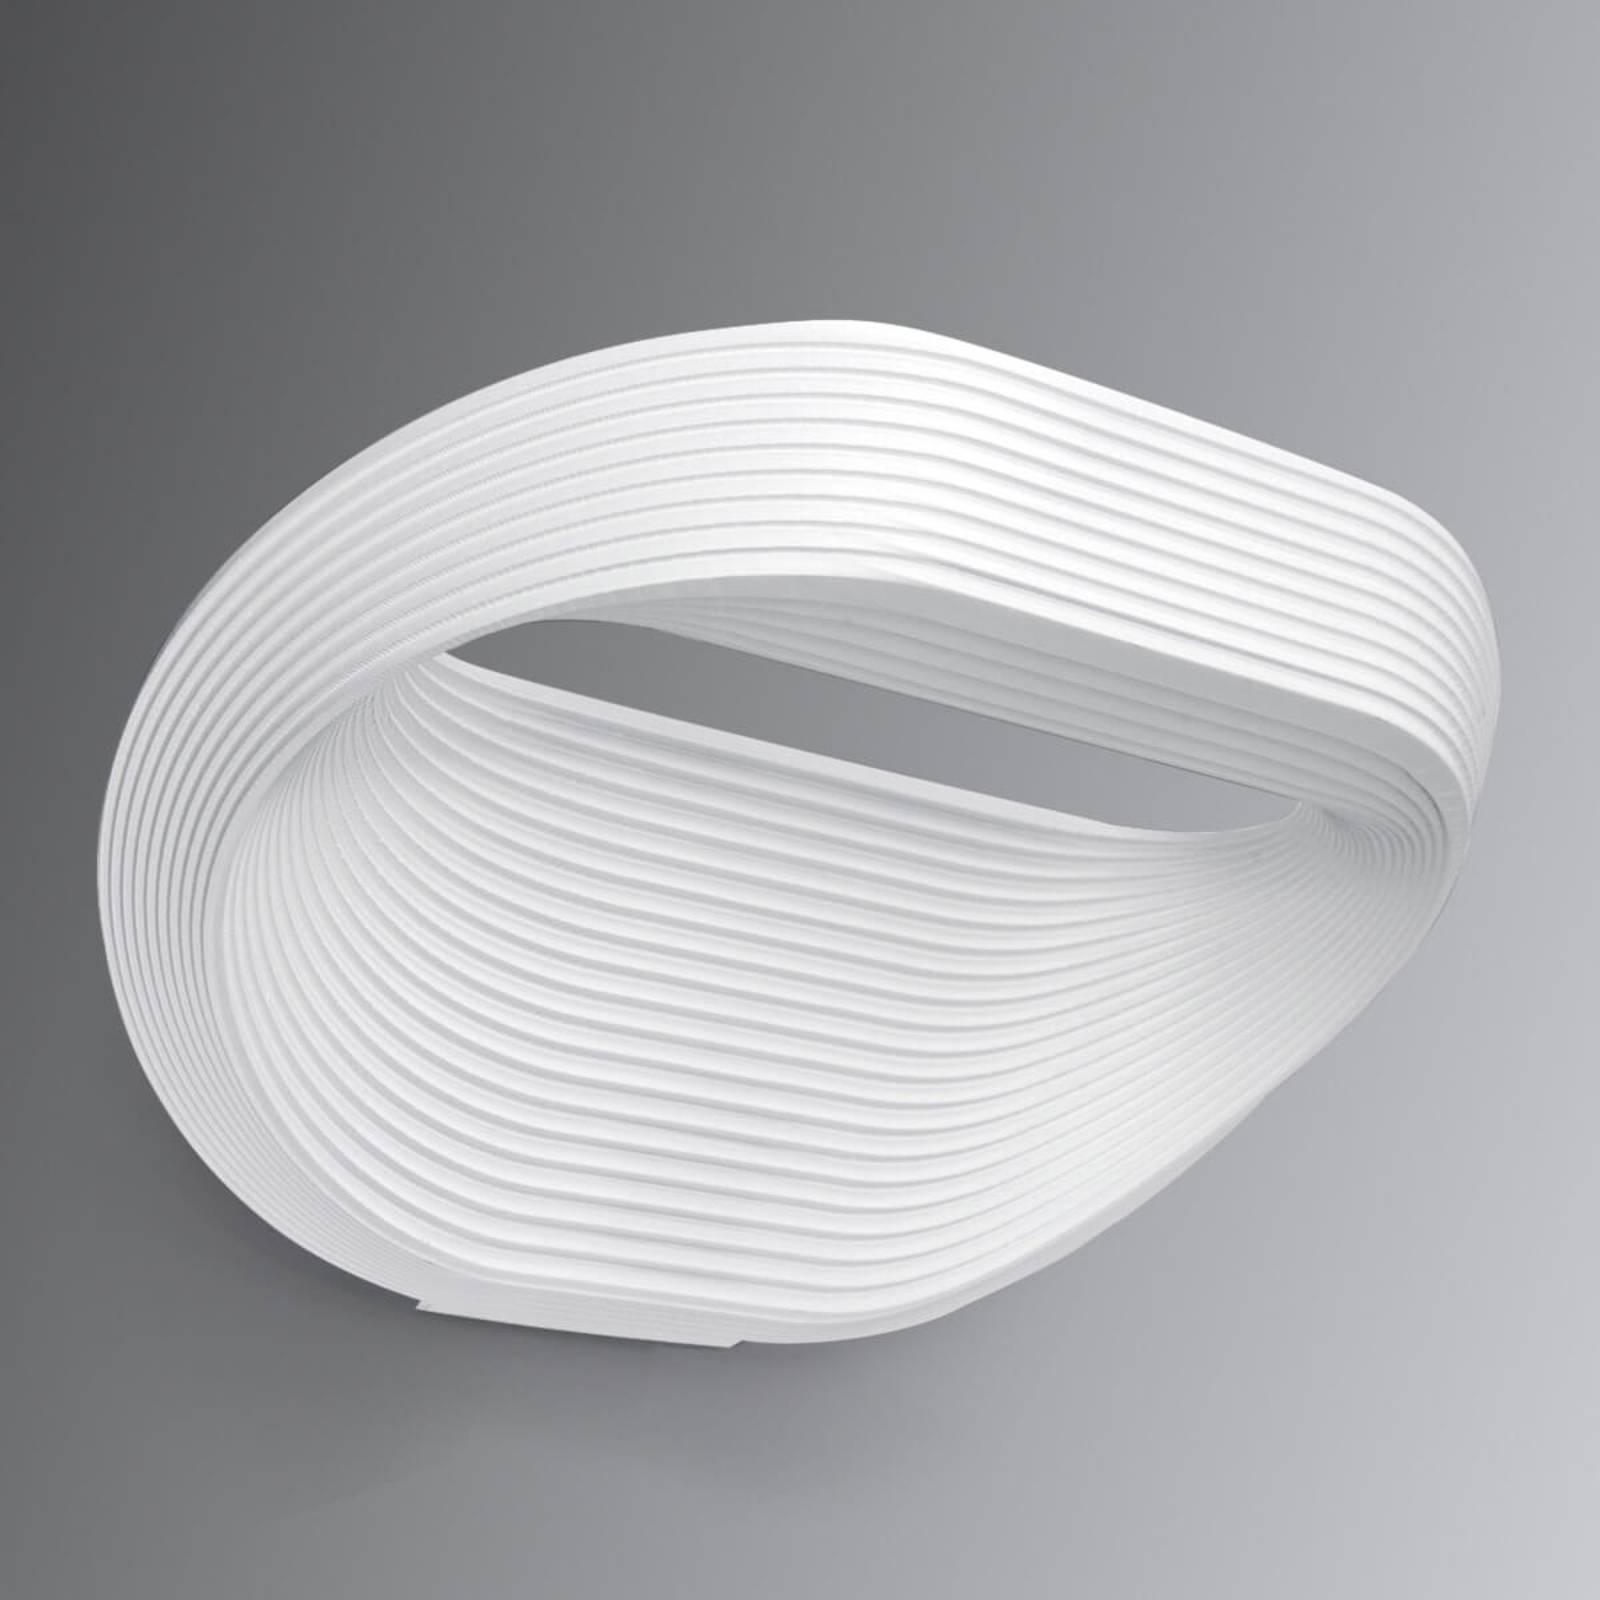 Cini&Nils Sestessa - weiße LED-Wandleuchte, 33 cm